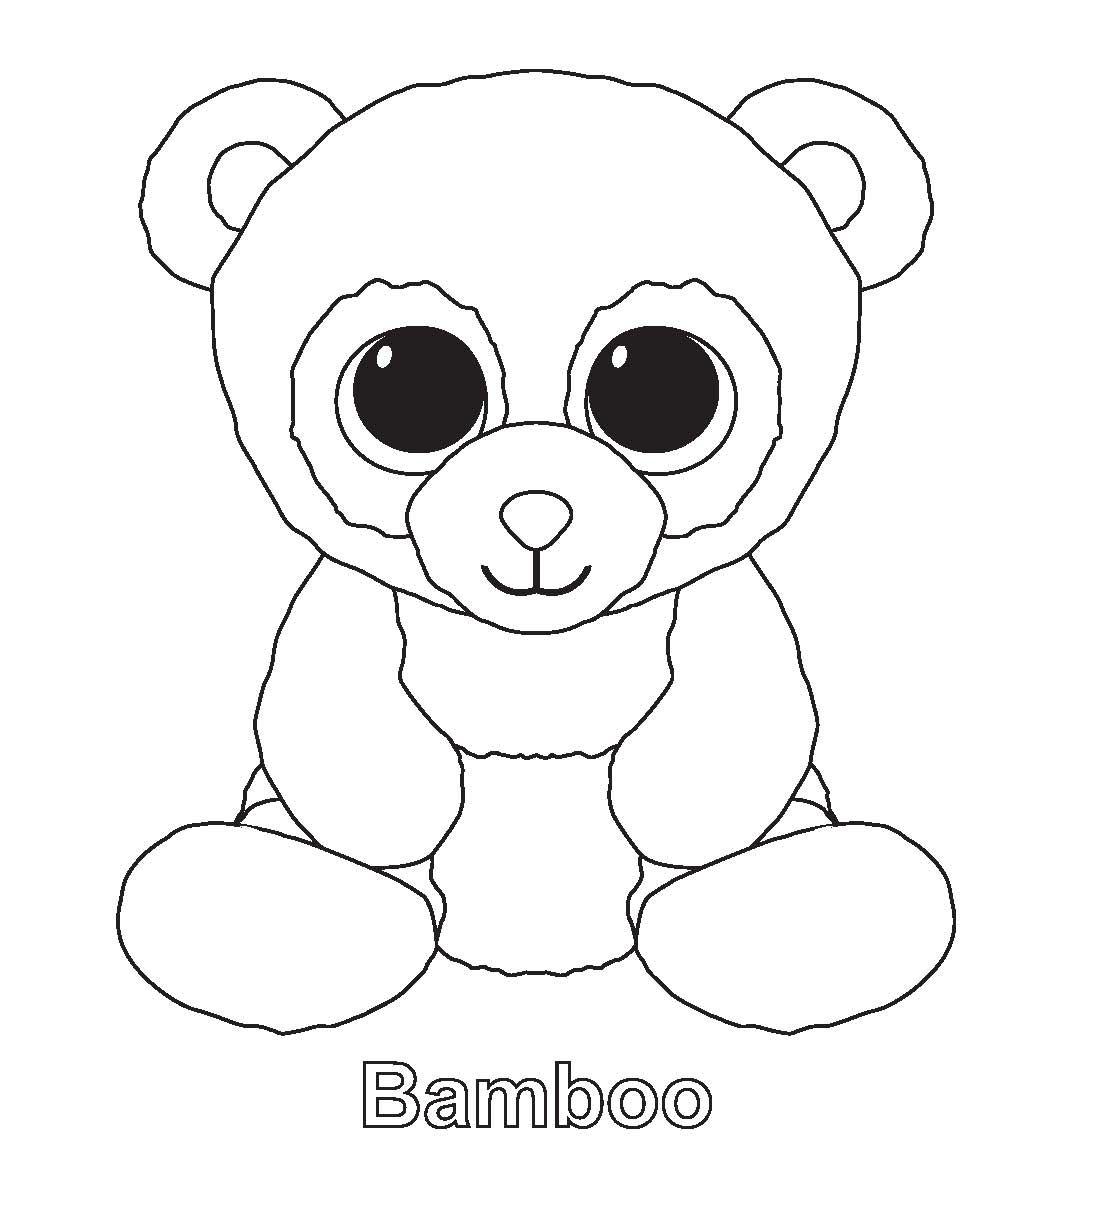 Bamboo TY Beanies Pinterest Beanie boos Ty beanie